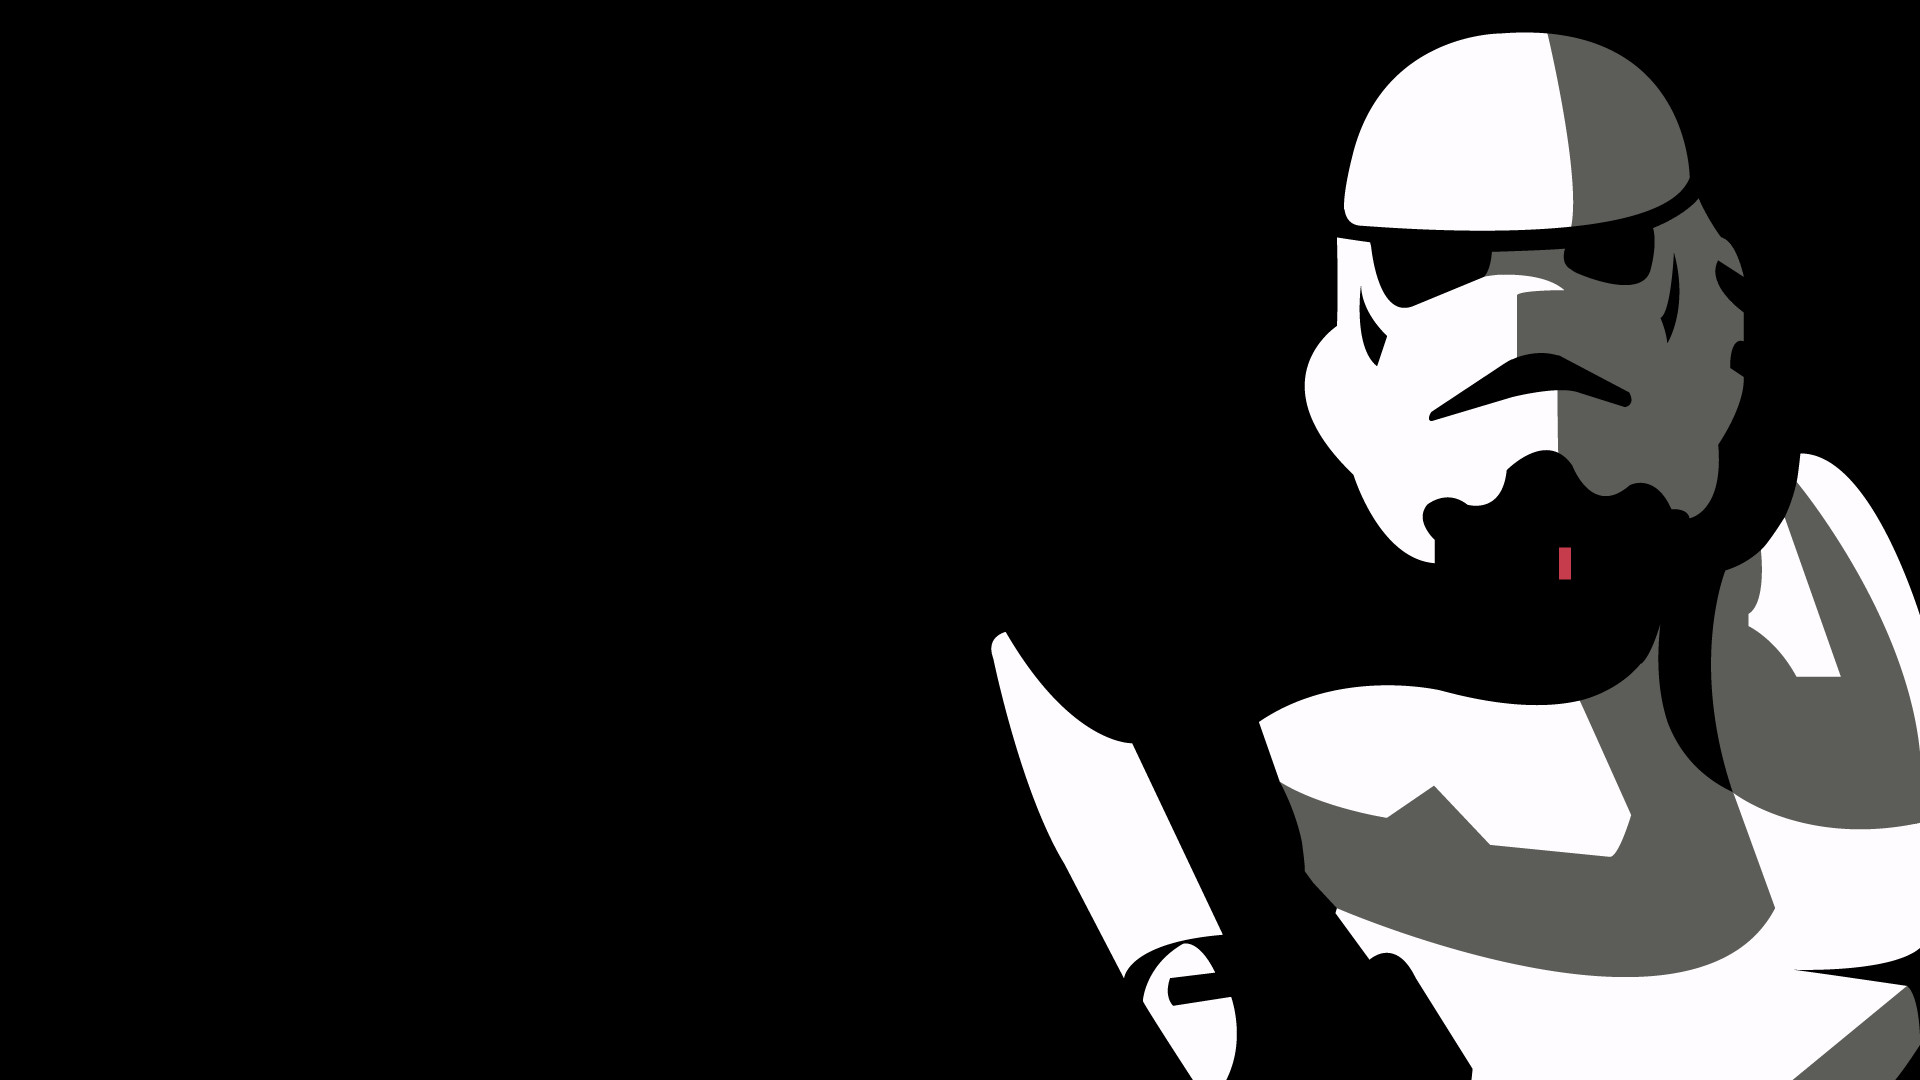 Star Wars Battlefront – Stormtrooper by GaryMotherPuckingOak on .